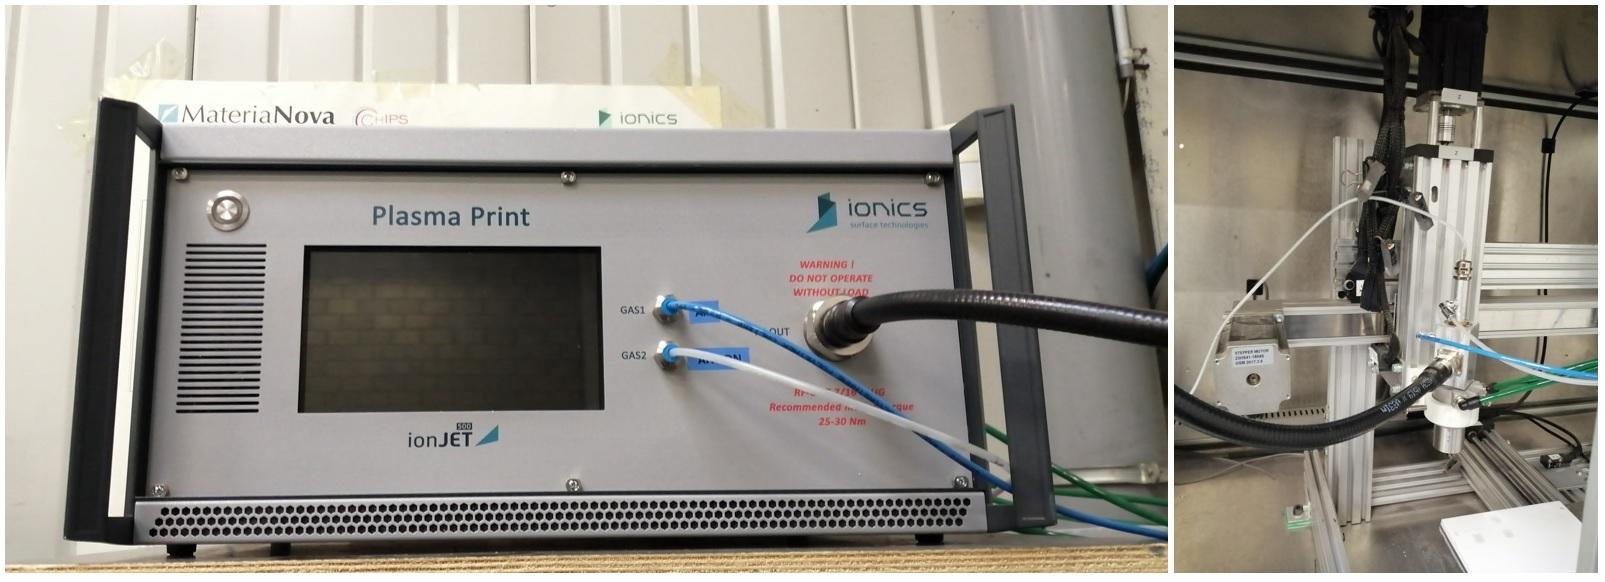 Plasmaprint_ionjet_ionics